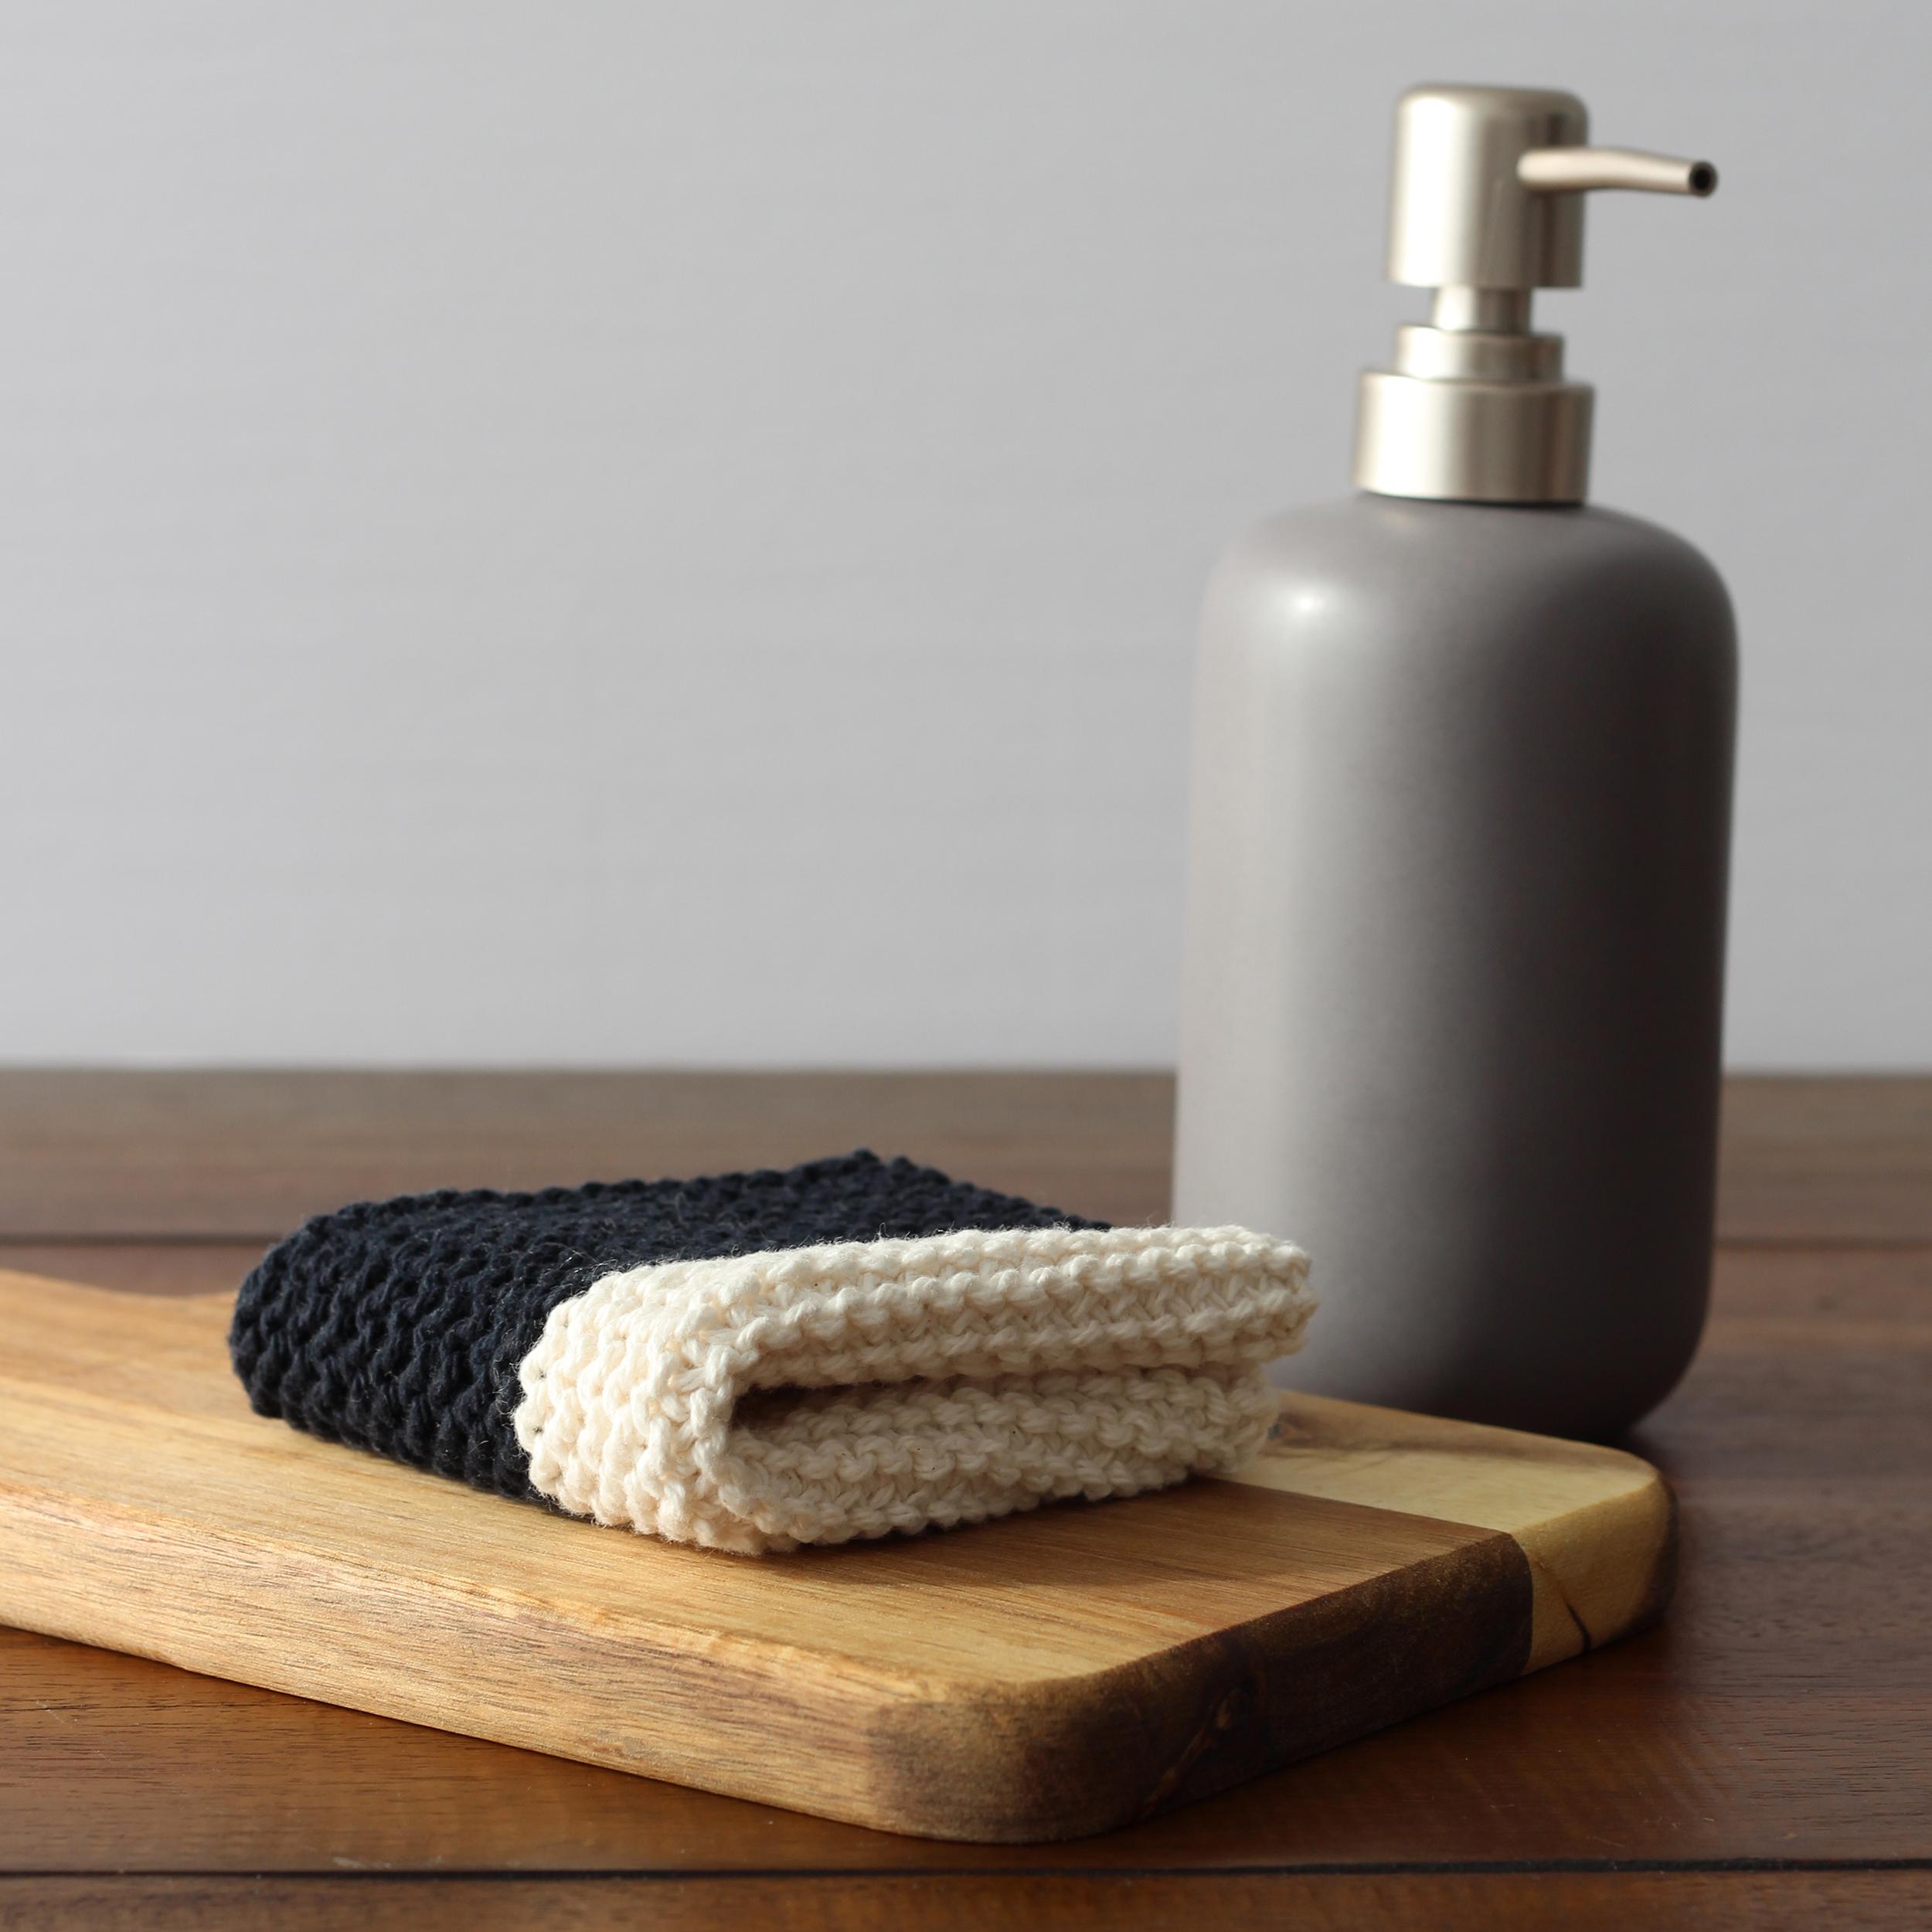 Dish Cloth with Soap Dispenser.jpg